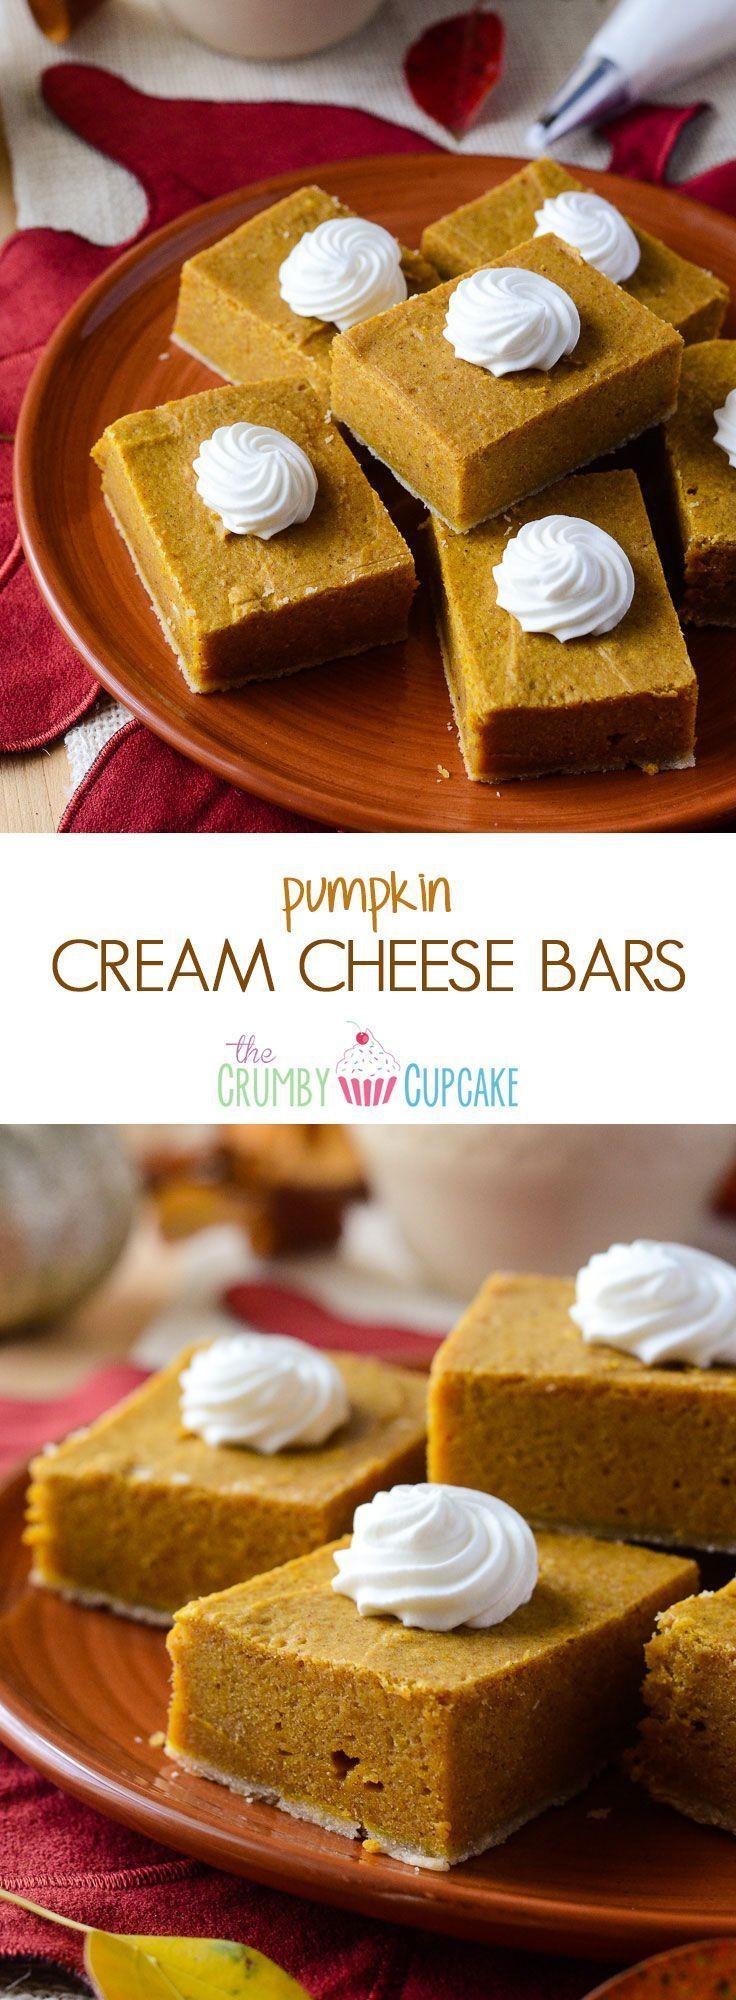 Pumpkin Cream Cheese Bars | Creamy, decadent little pumpkin pie bars, made with lots of love and cream cheese!